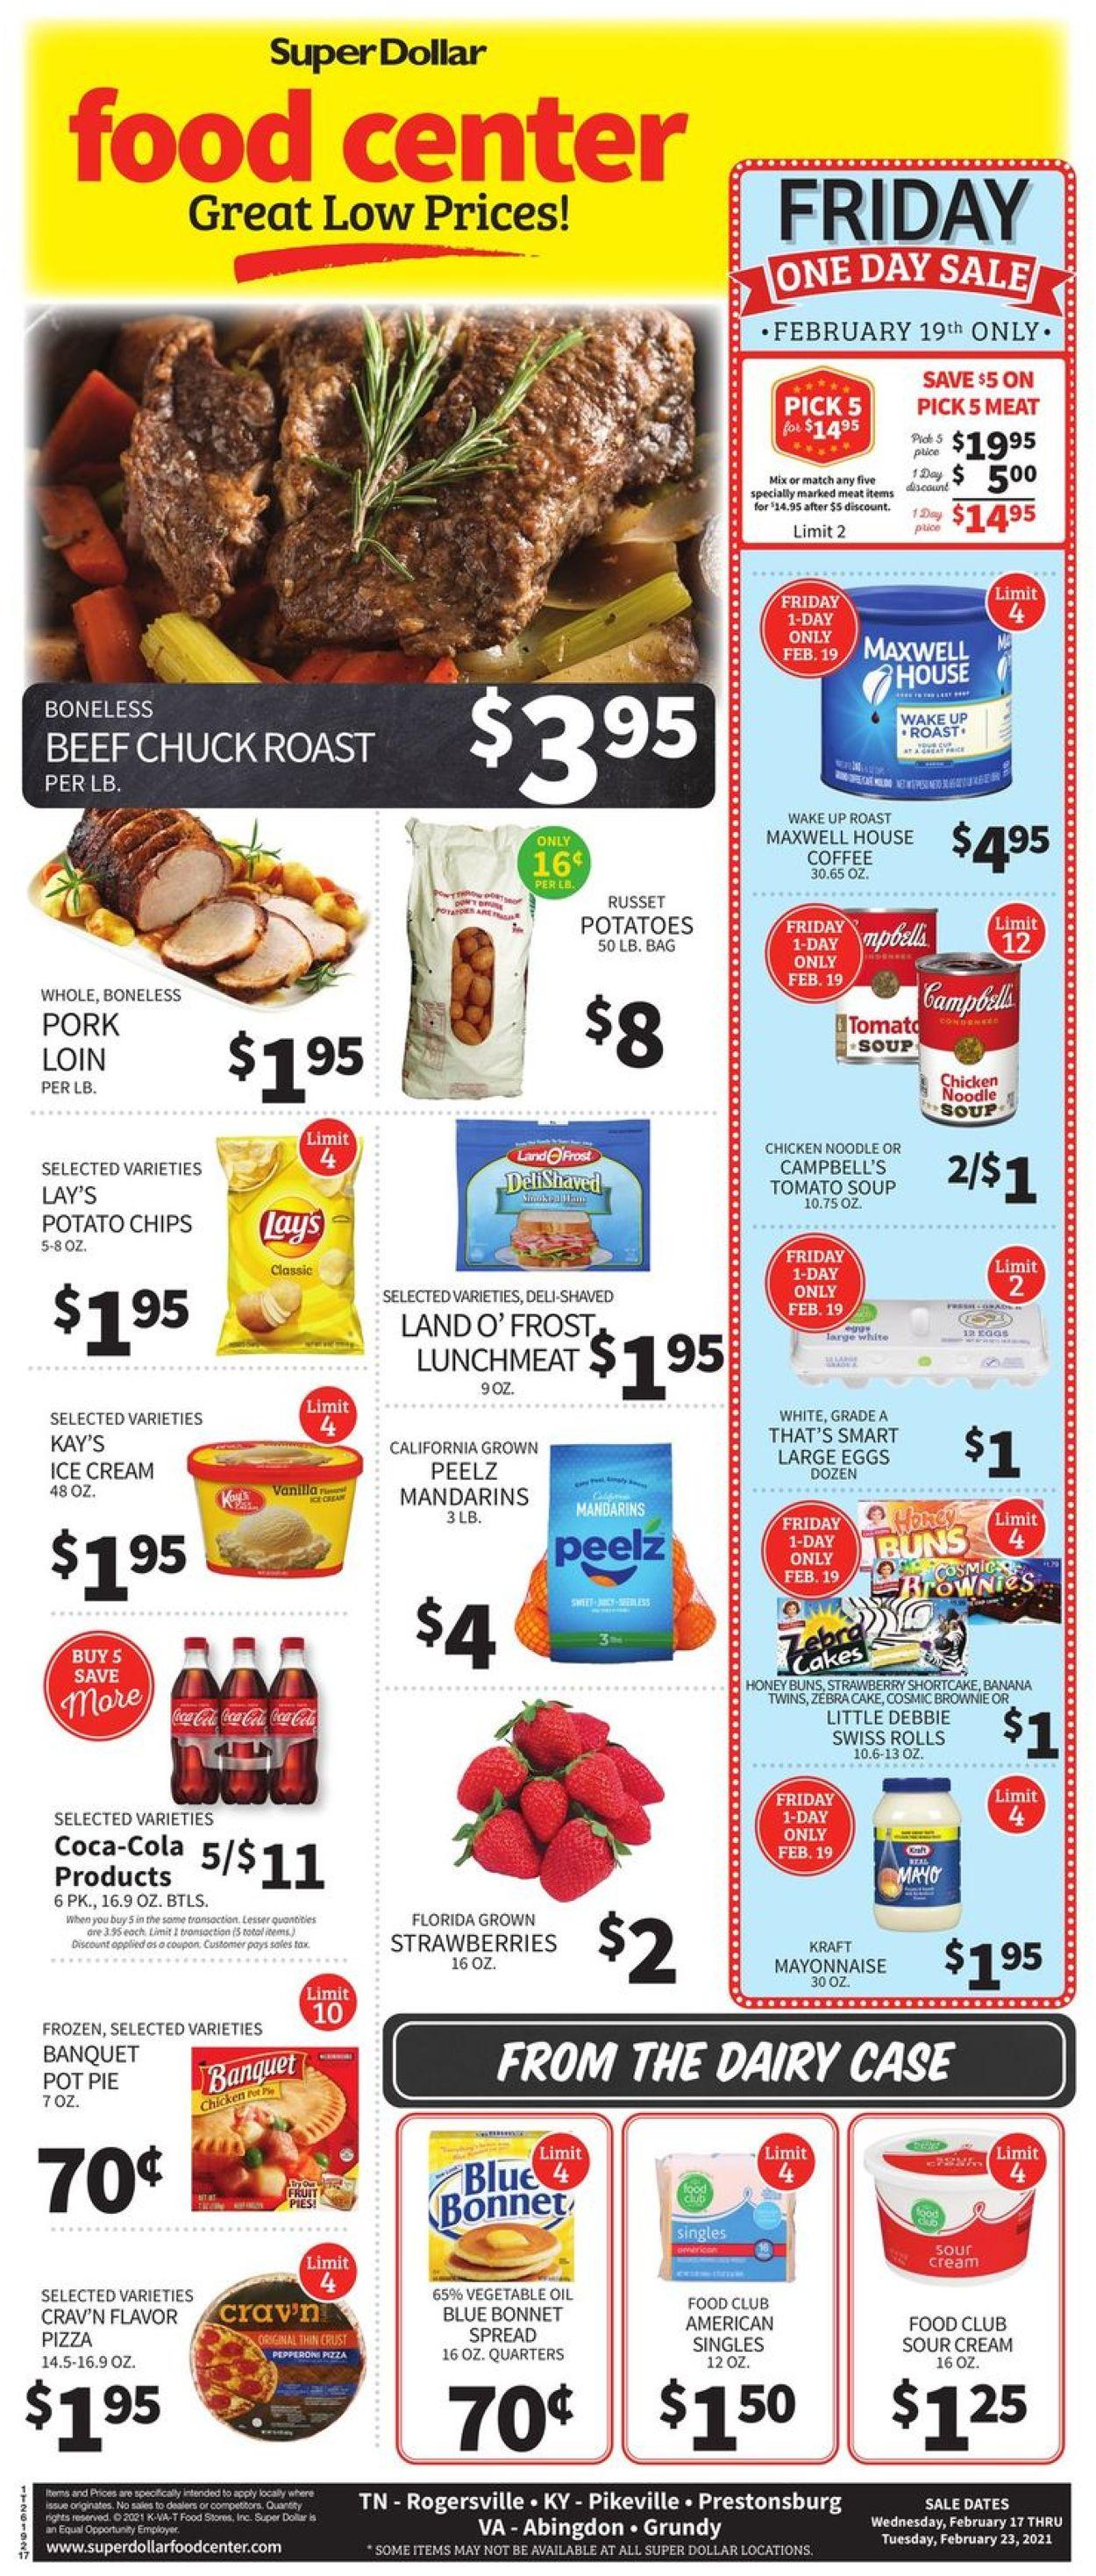 Super Dollar Food Center Weekly Ad Circular - valid 02/17-02/23/2021